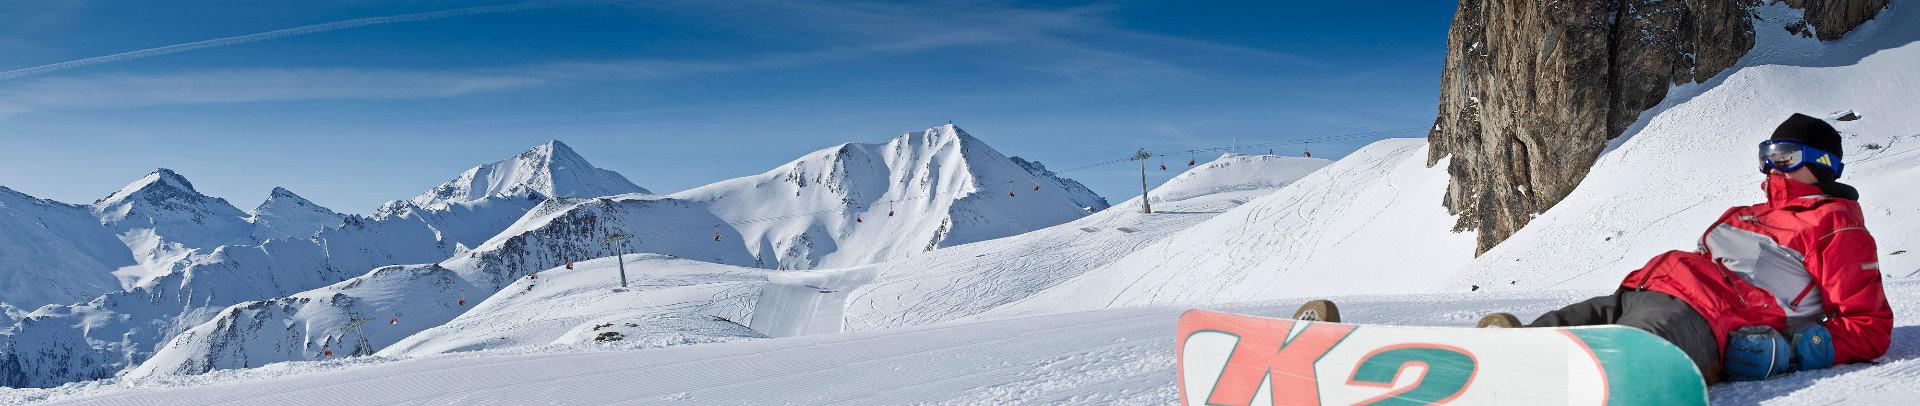 Snowboarder in Samnaun - © Andrea Badrutt